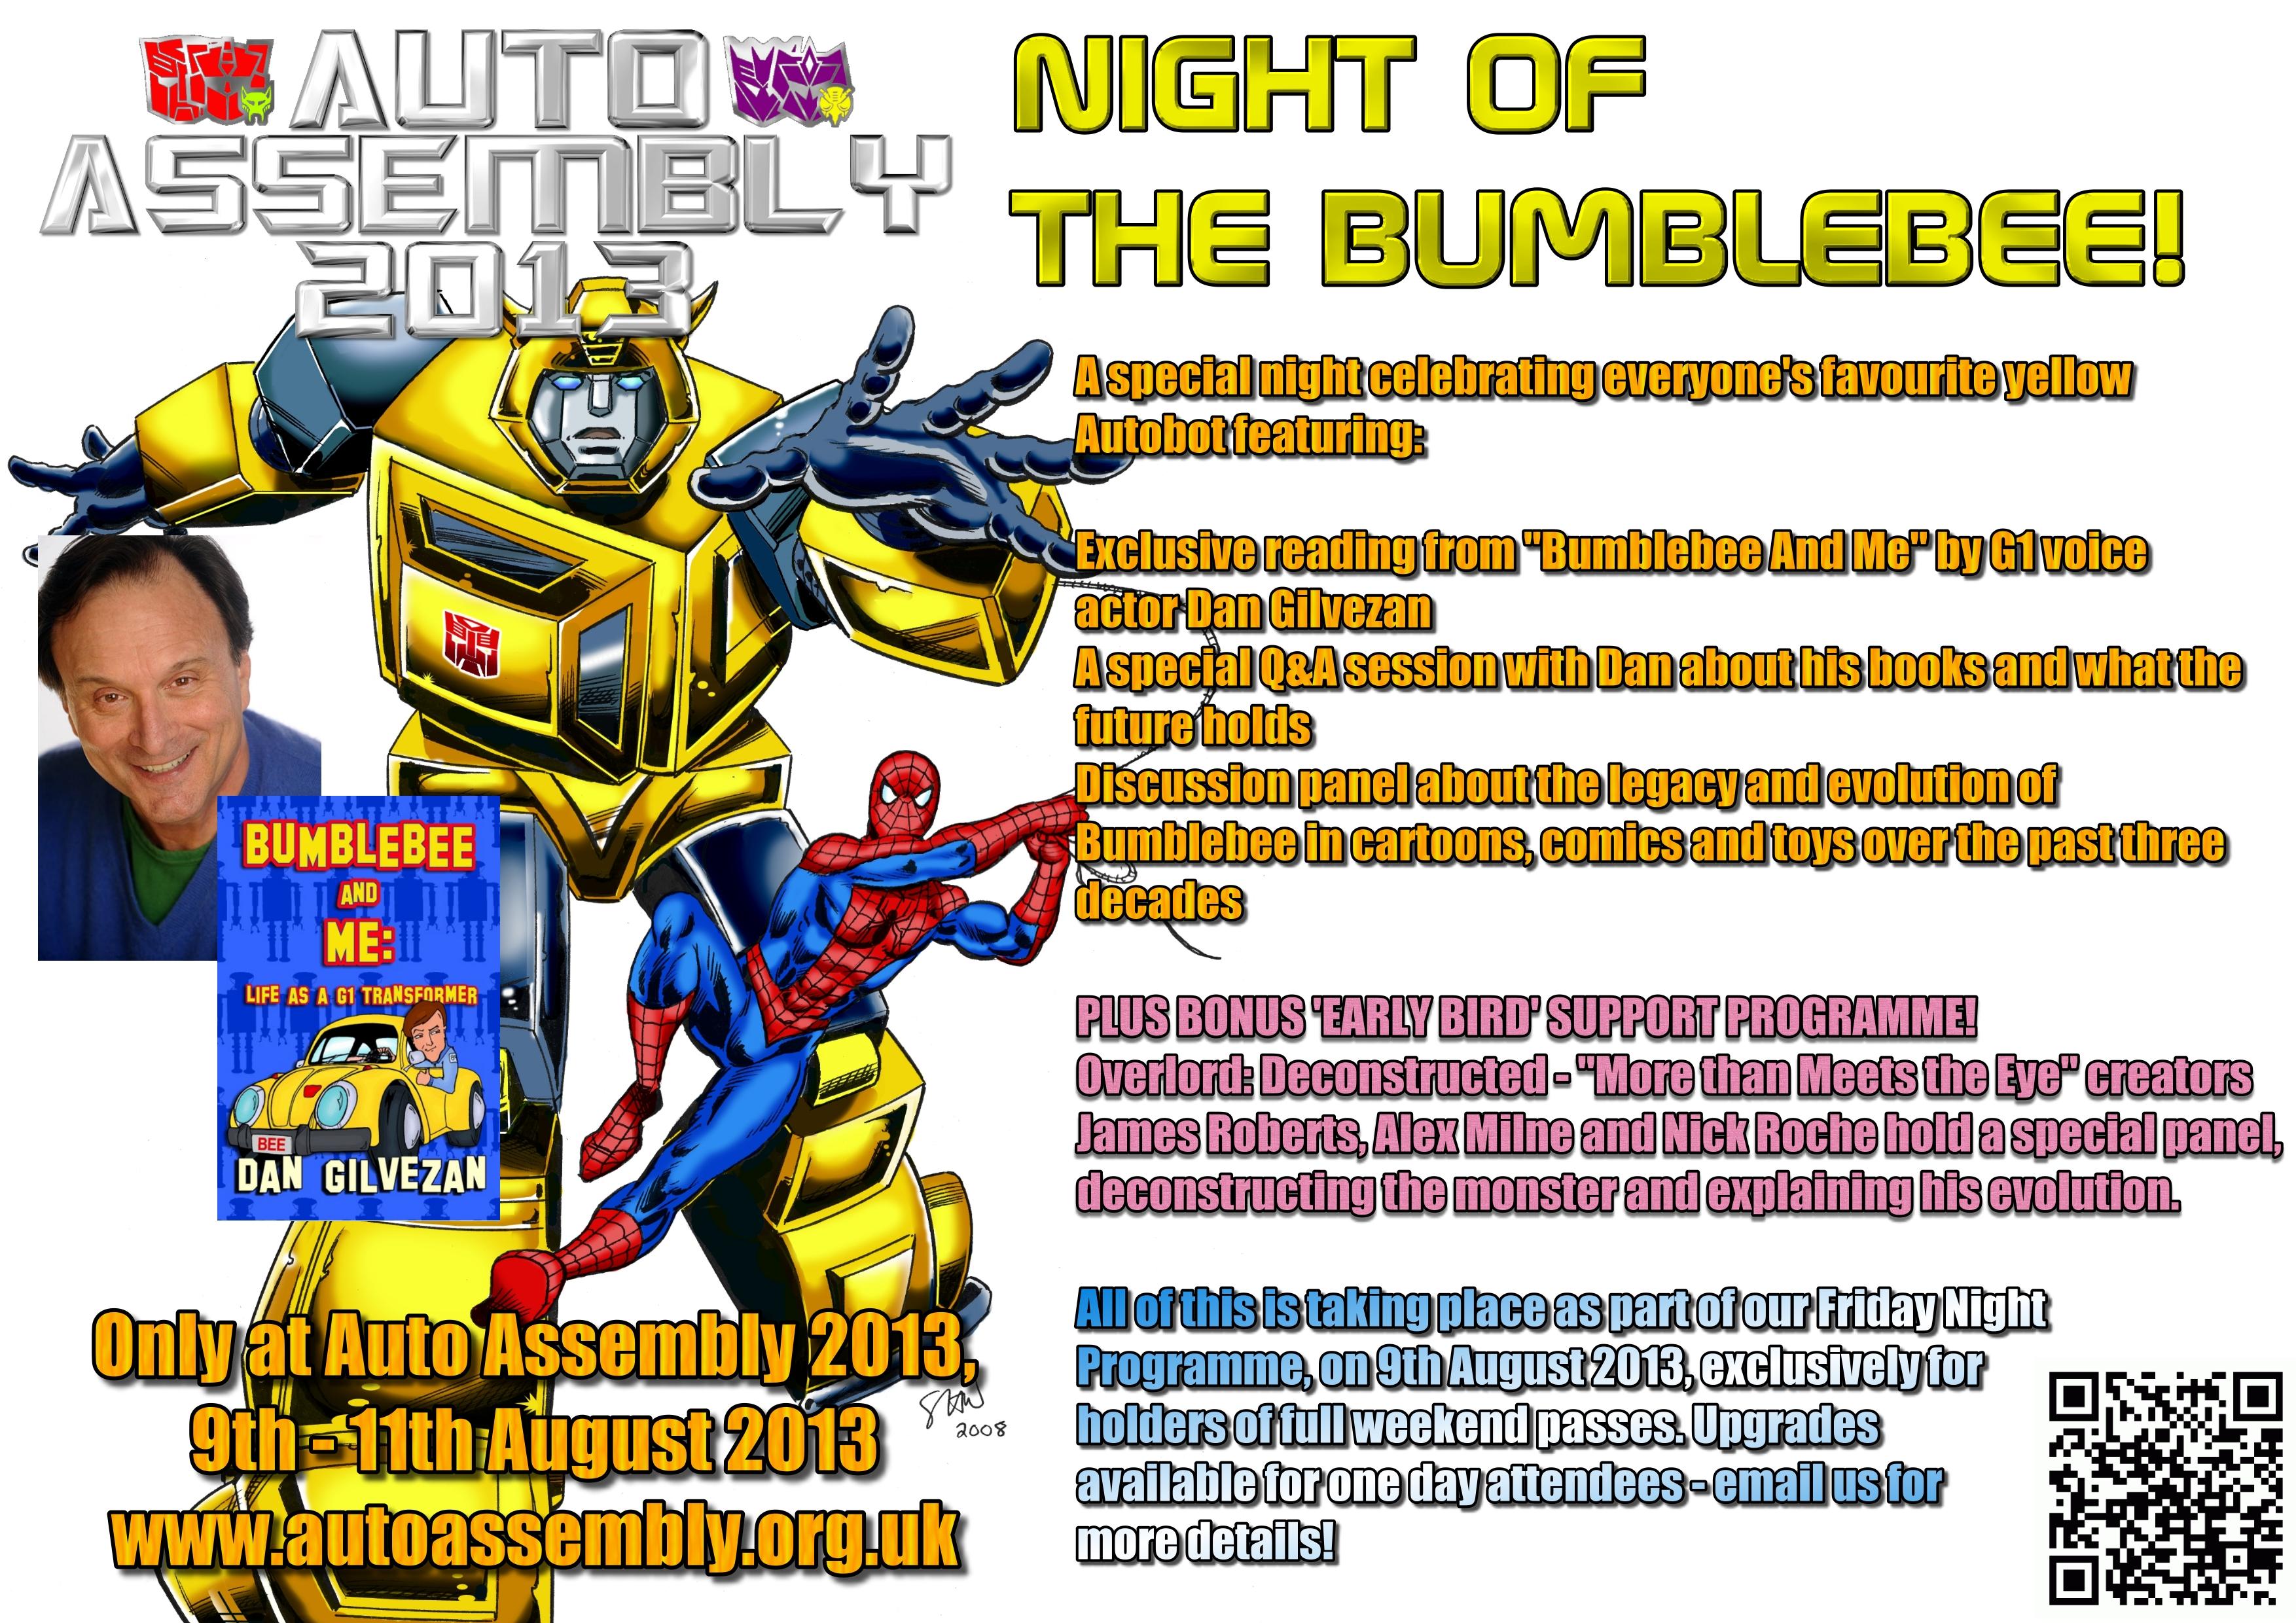 Night Of The Bumblebee